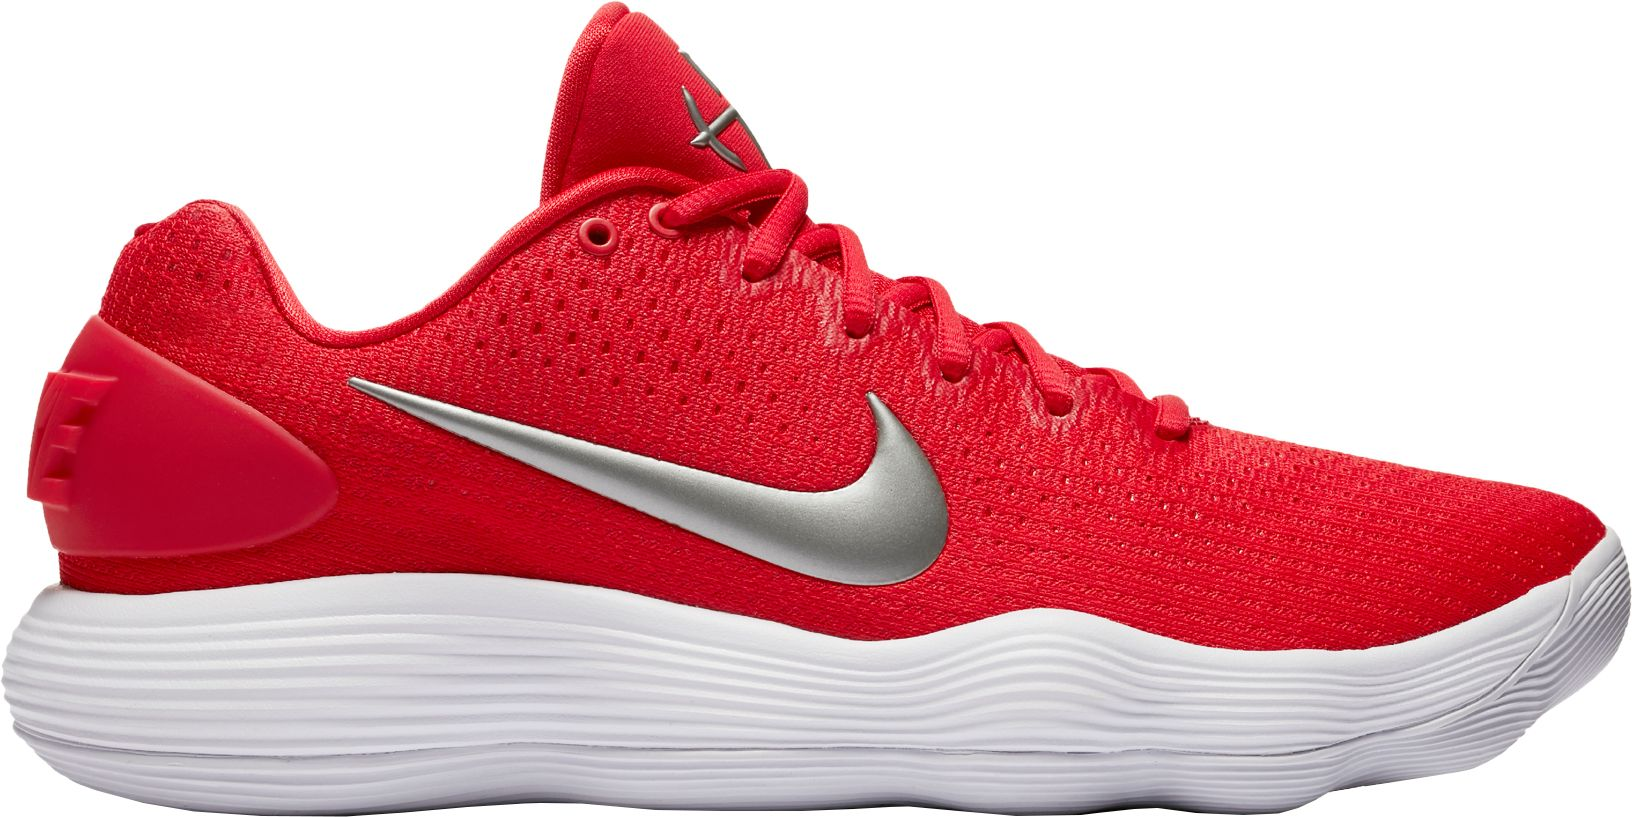 nike basketball shoes womens 2017. nike basketball shoes womens 2017